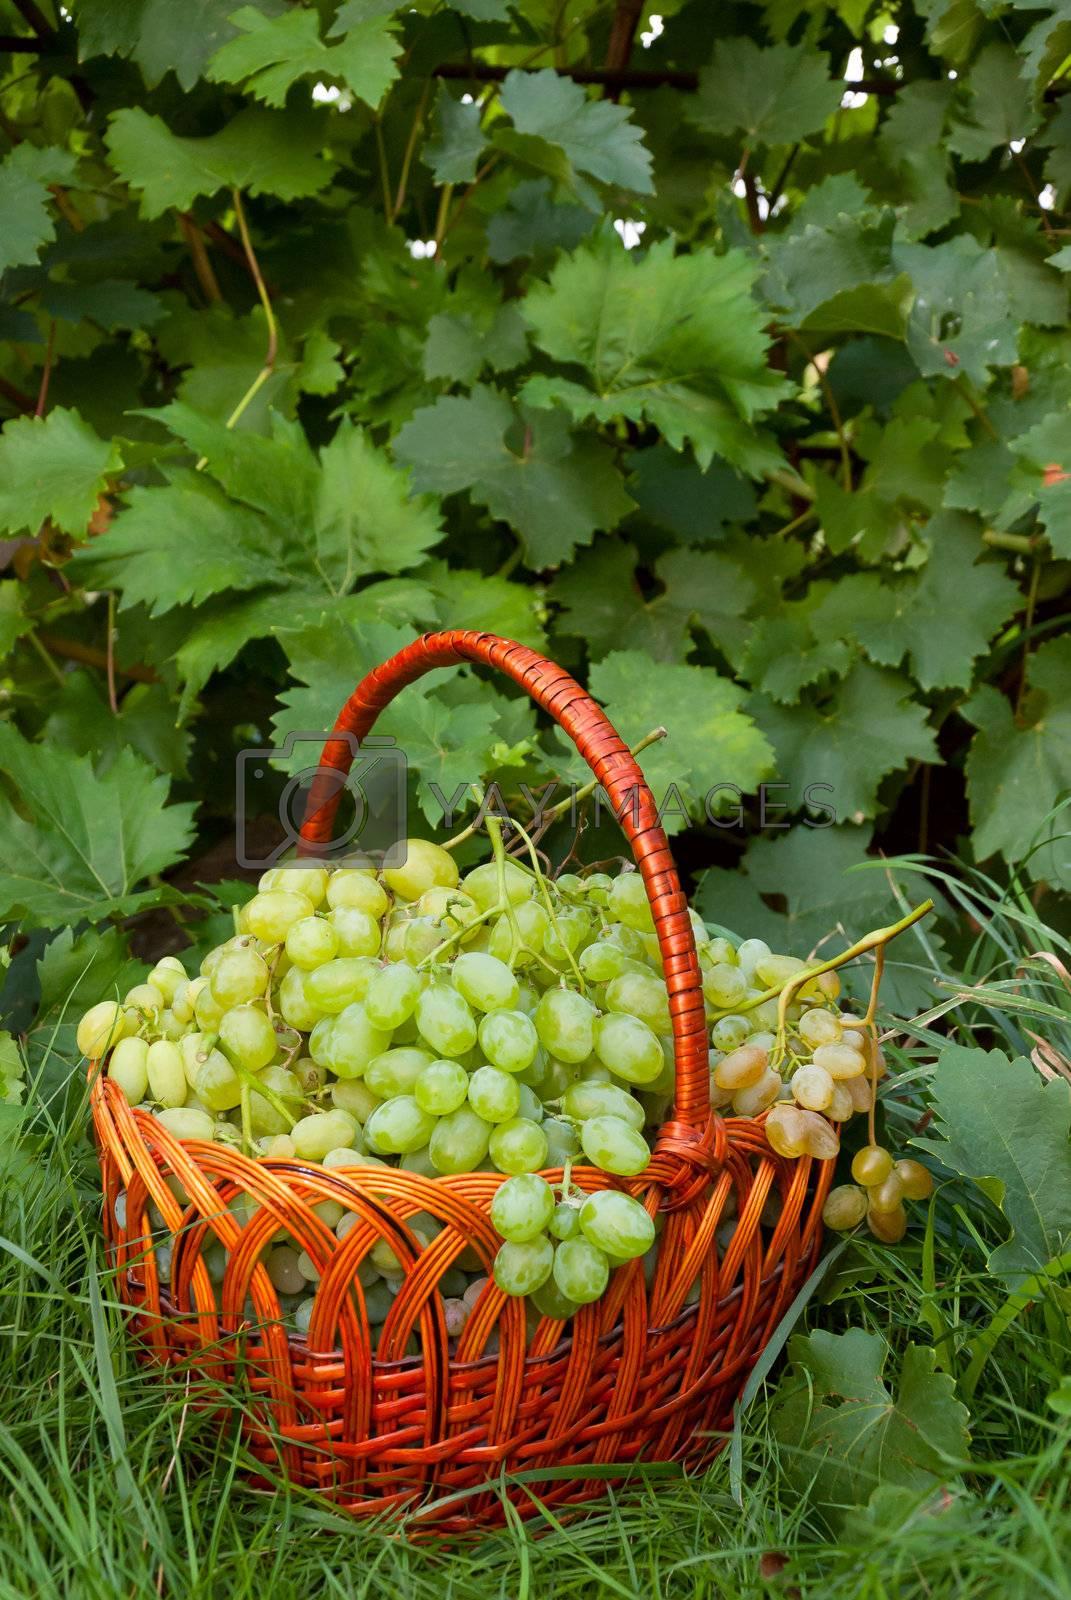 Ripe green grapes in wicker basket on grass in garden, grapevine background, outdoor